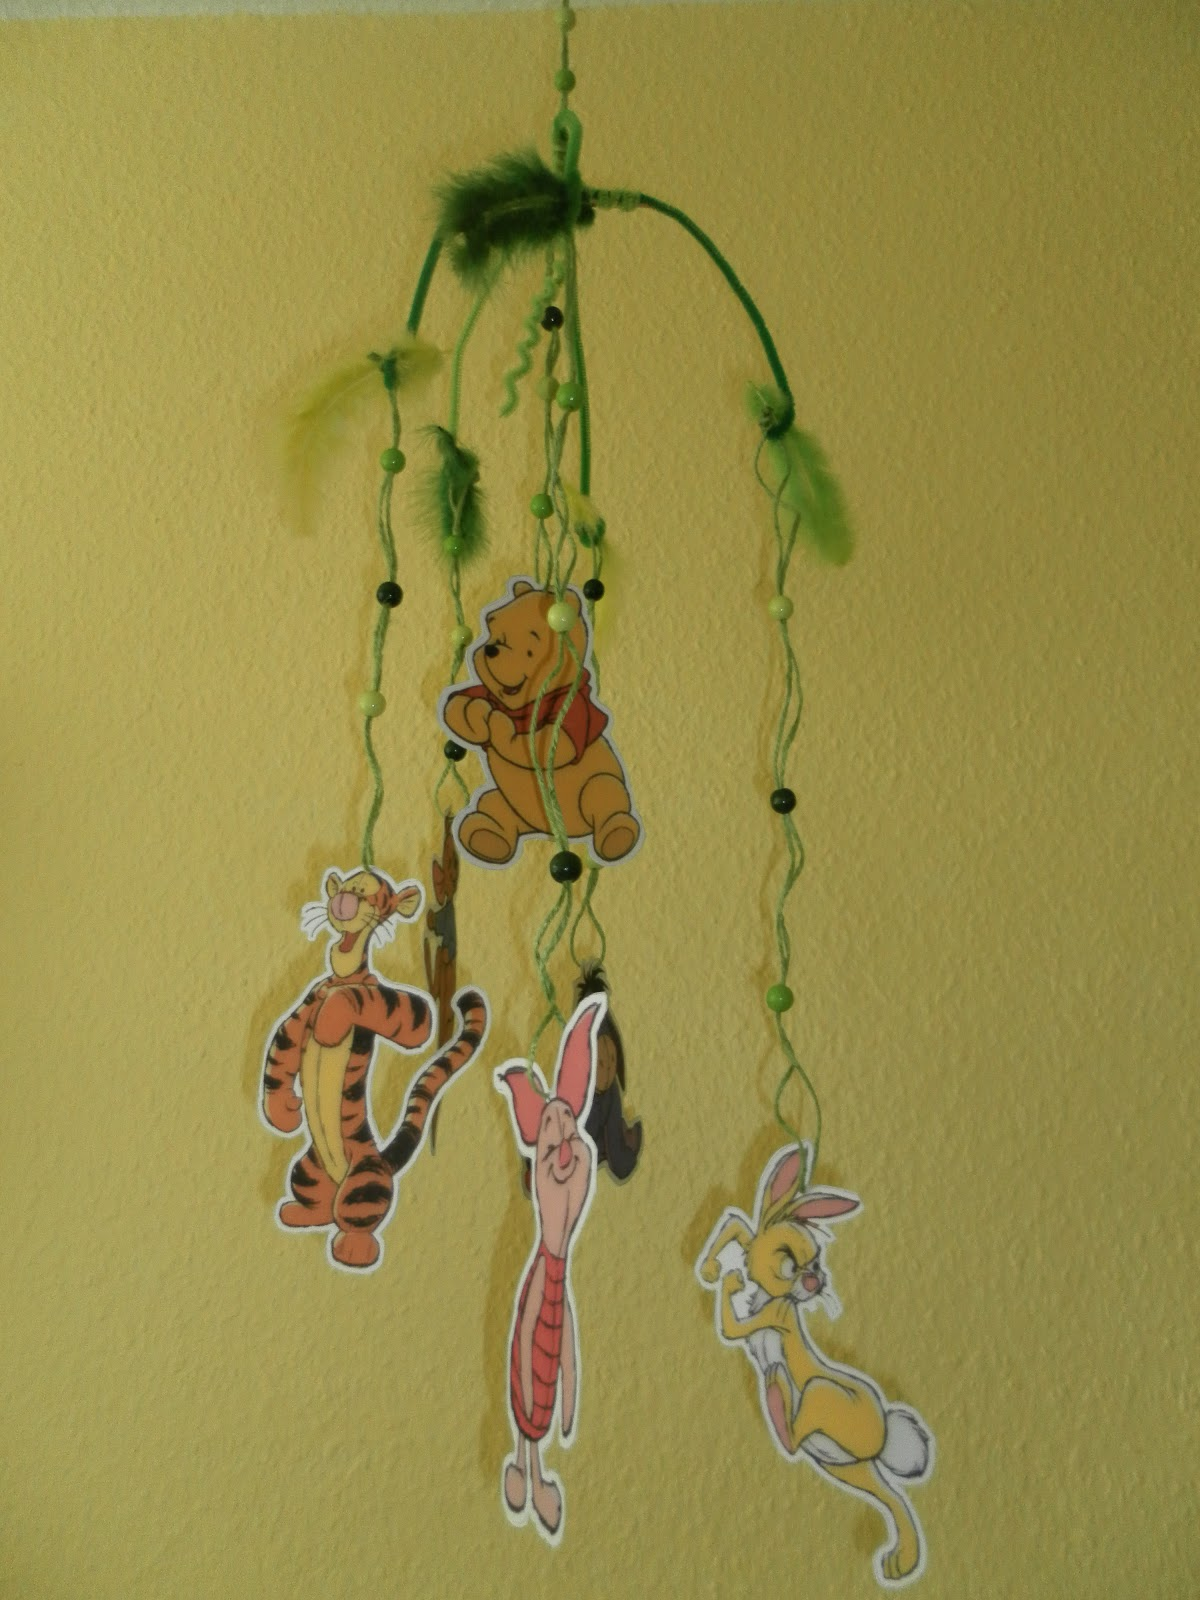 Nuckelpille by BF: Bastel - Tipp Winnie Pooh Mobile